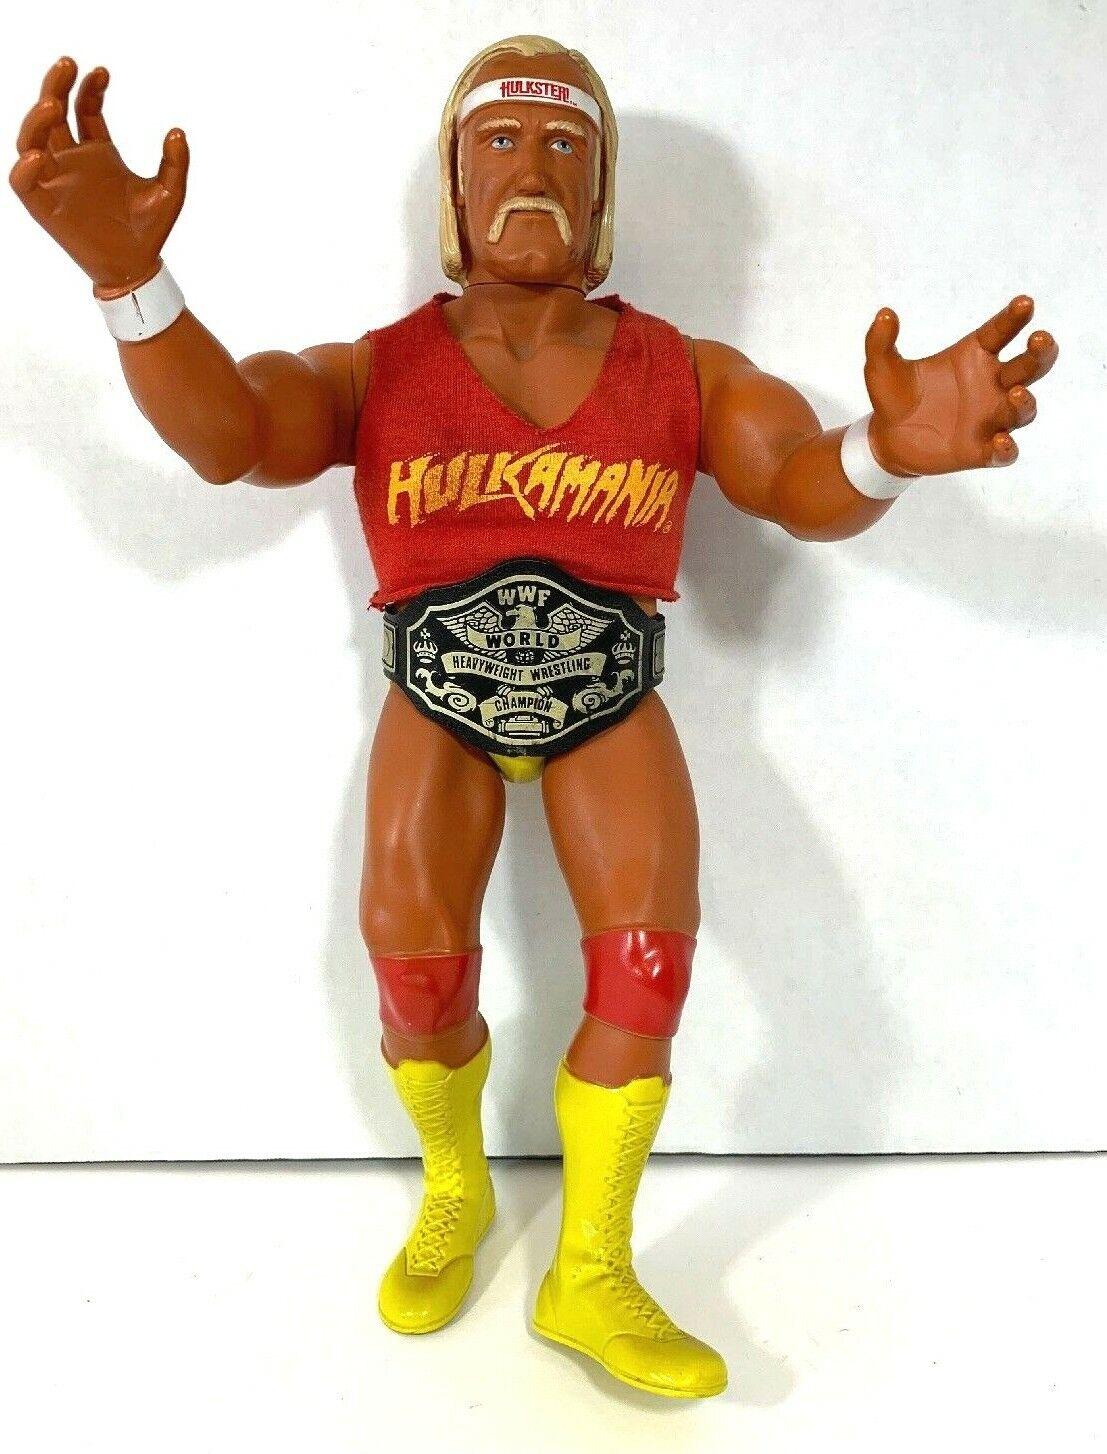 WWE WWF 1985 LJN HULK HOGAN 16 WRESTLING POSEABLE cifra HULKAuomoIA VINTAGE